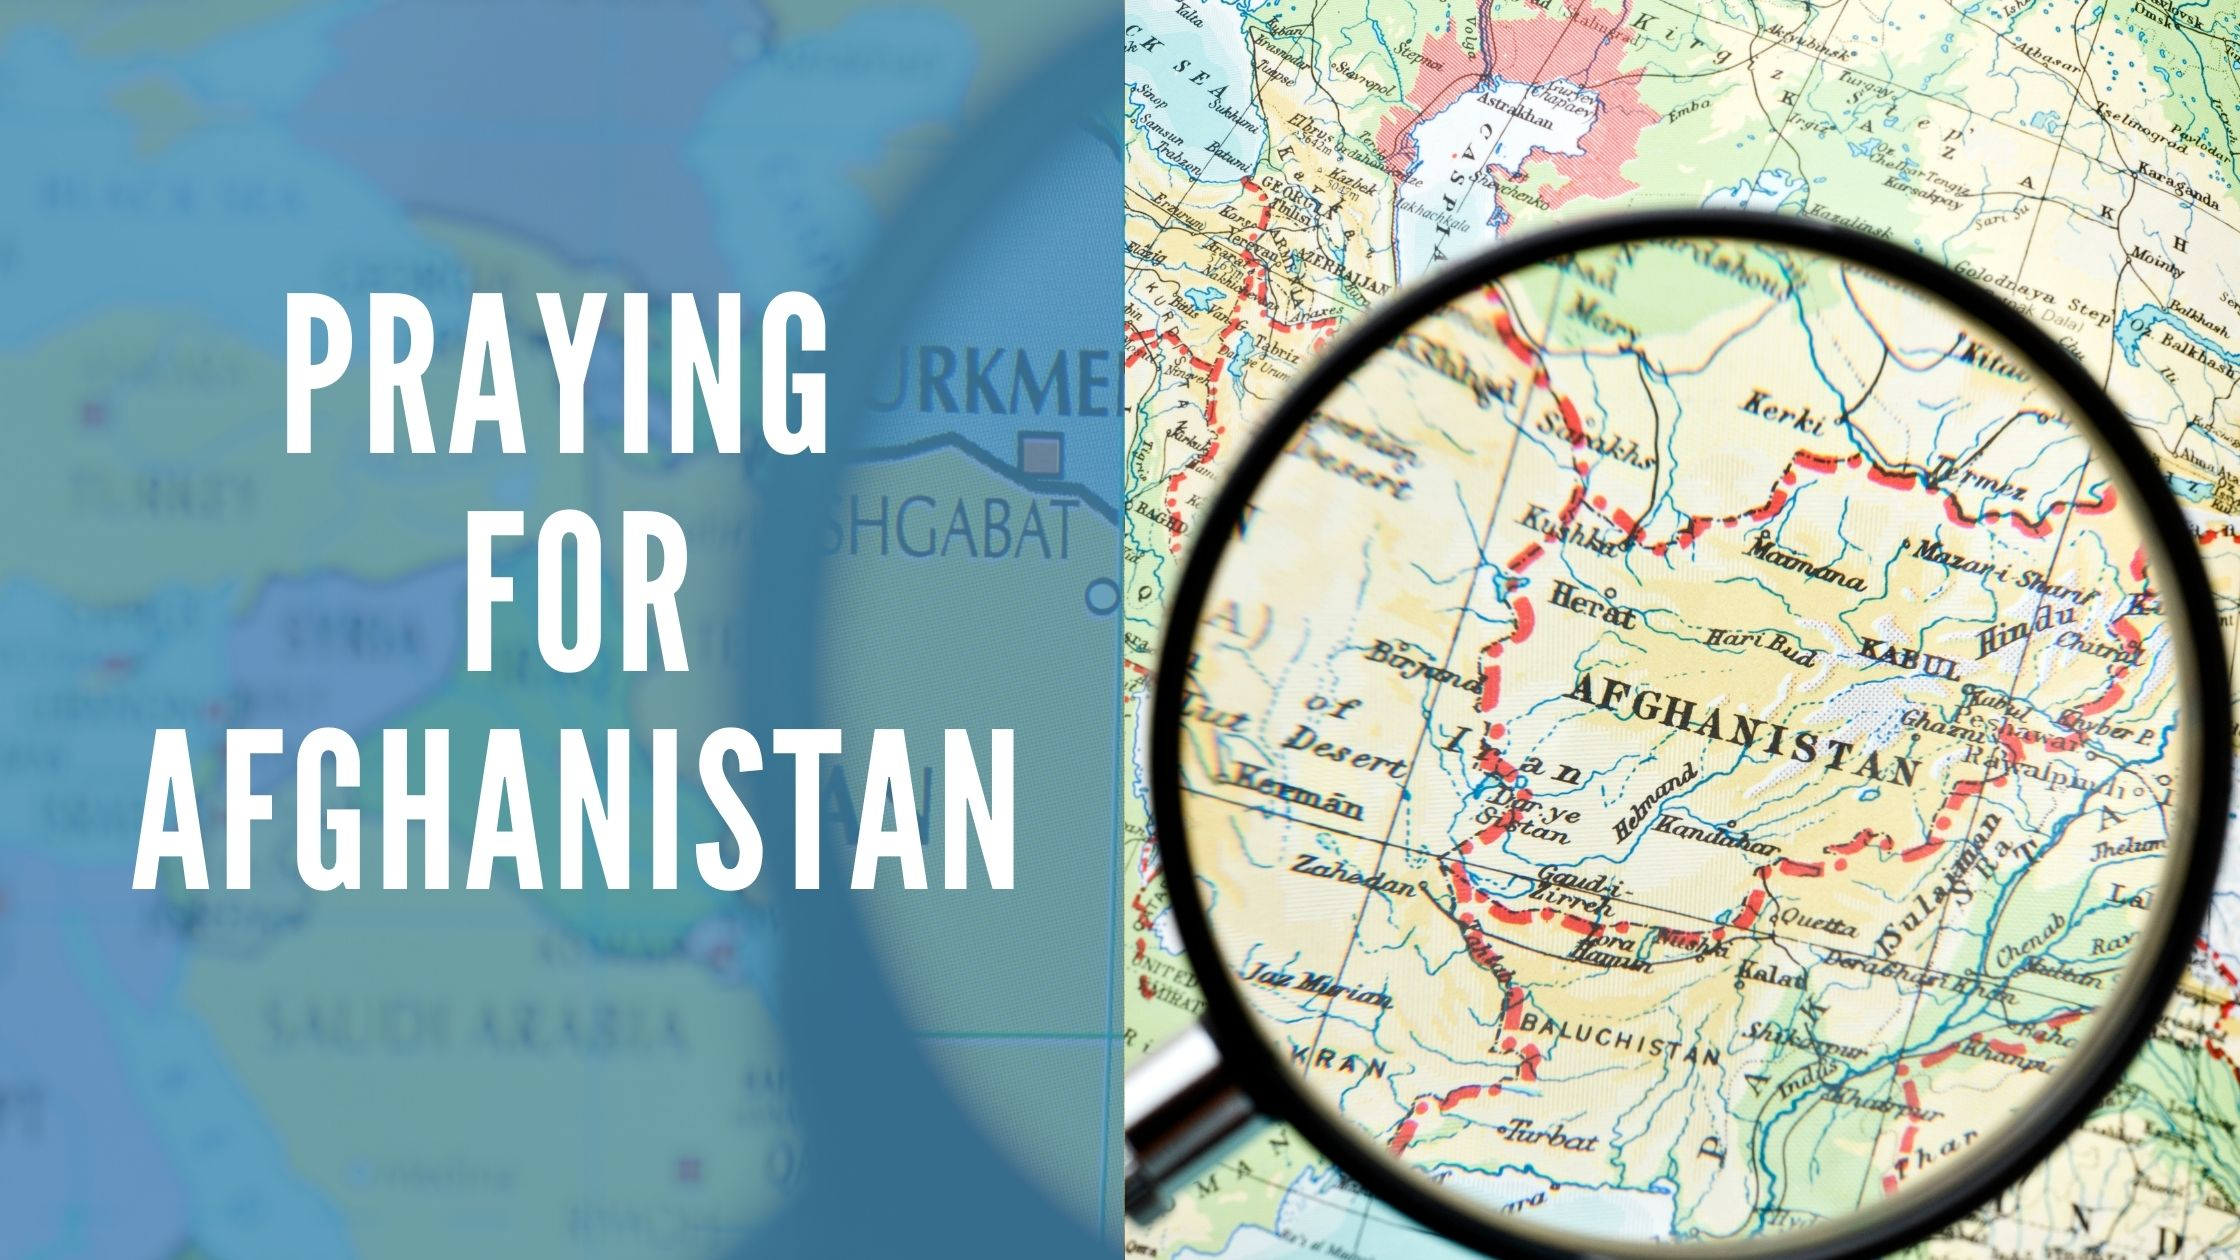 Praying for Afghanistan